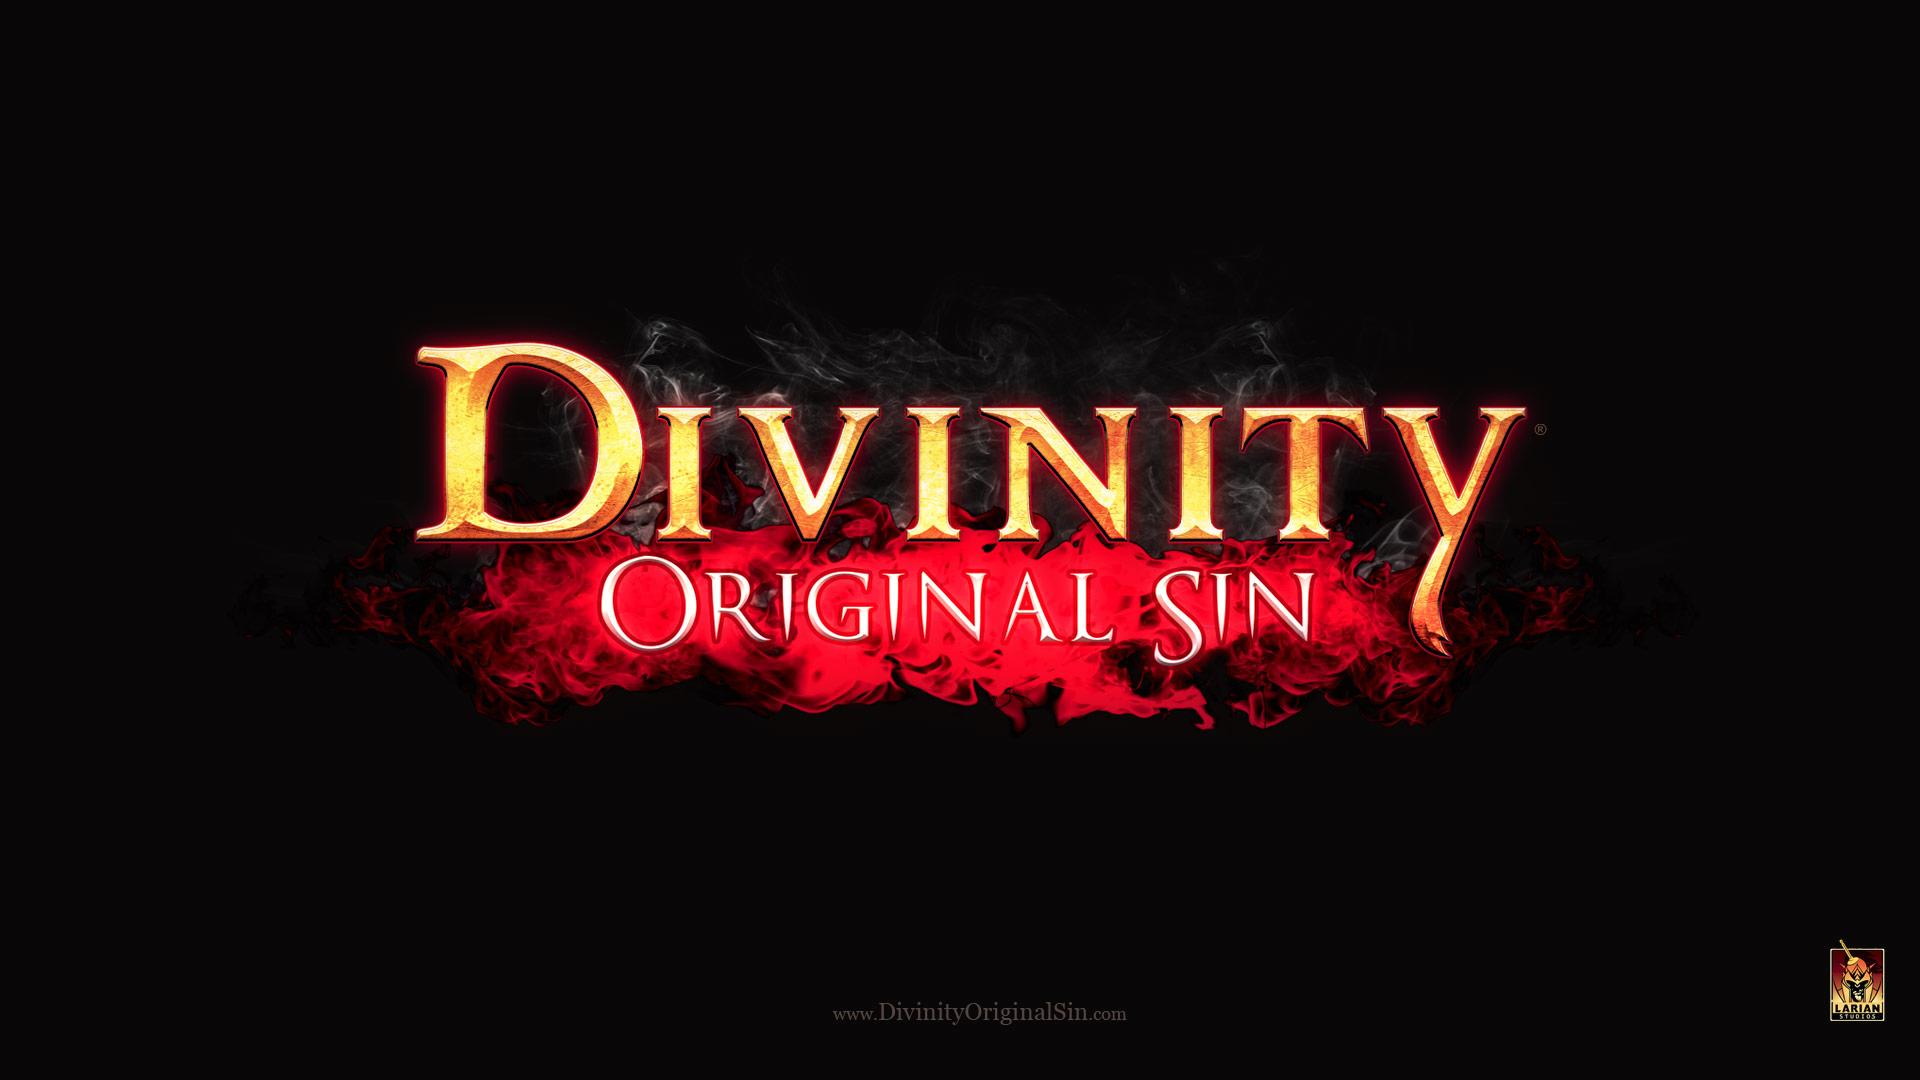 Divinity Original Sin wallpaper 3